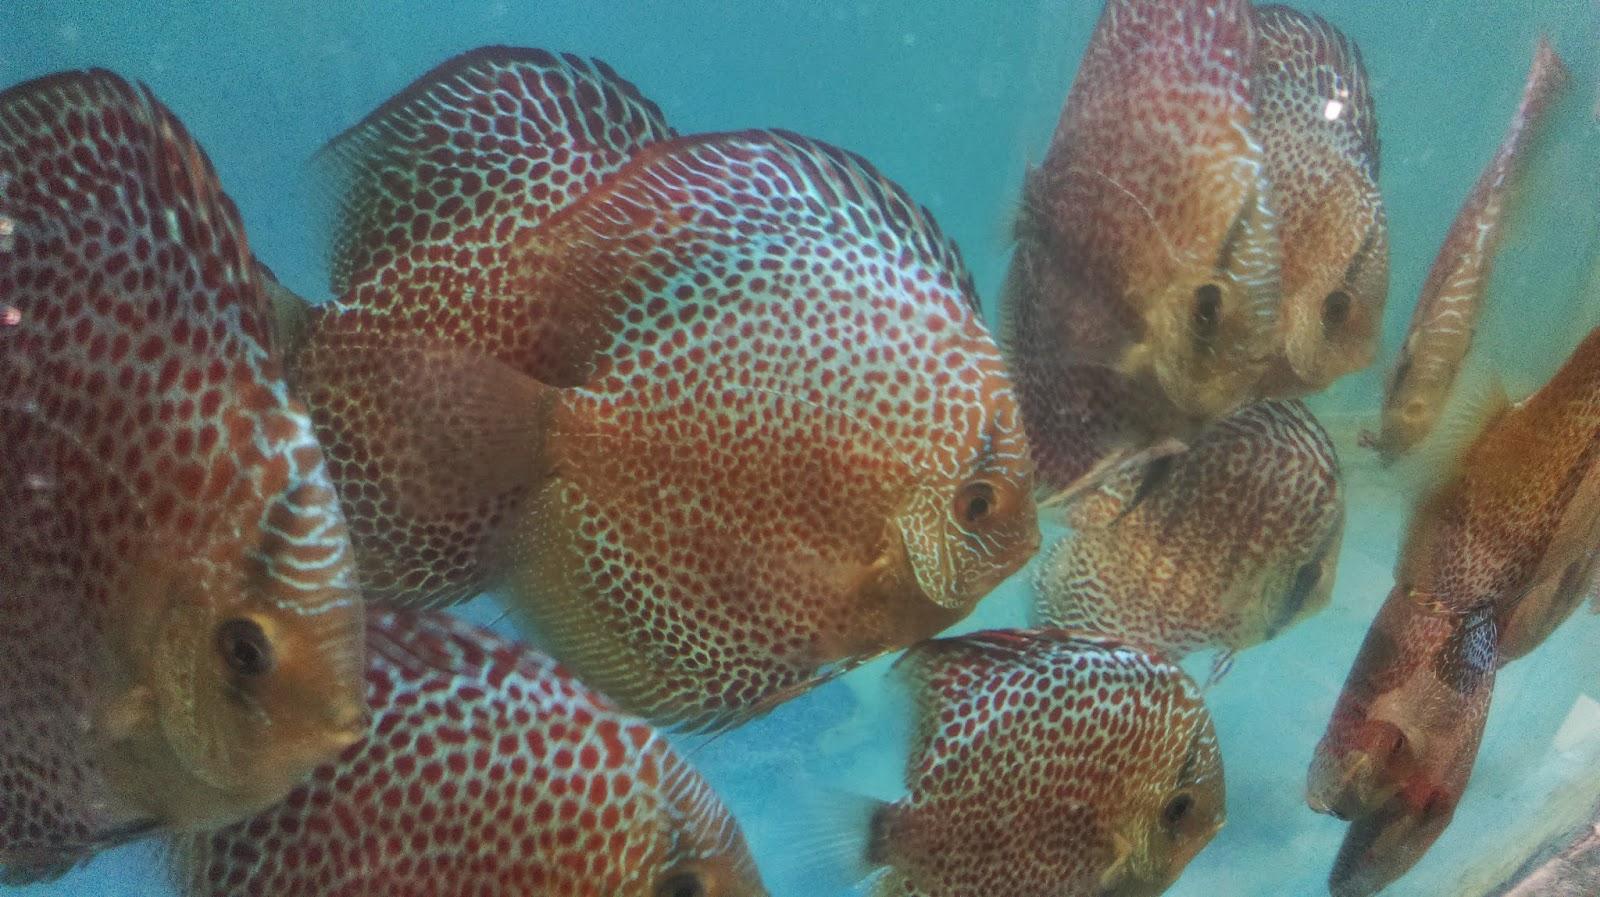 Aquarium fish tank for sale - Discus Fish For Sale Singapore 2014 2017 Fish Tank Maintenance